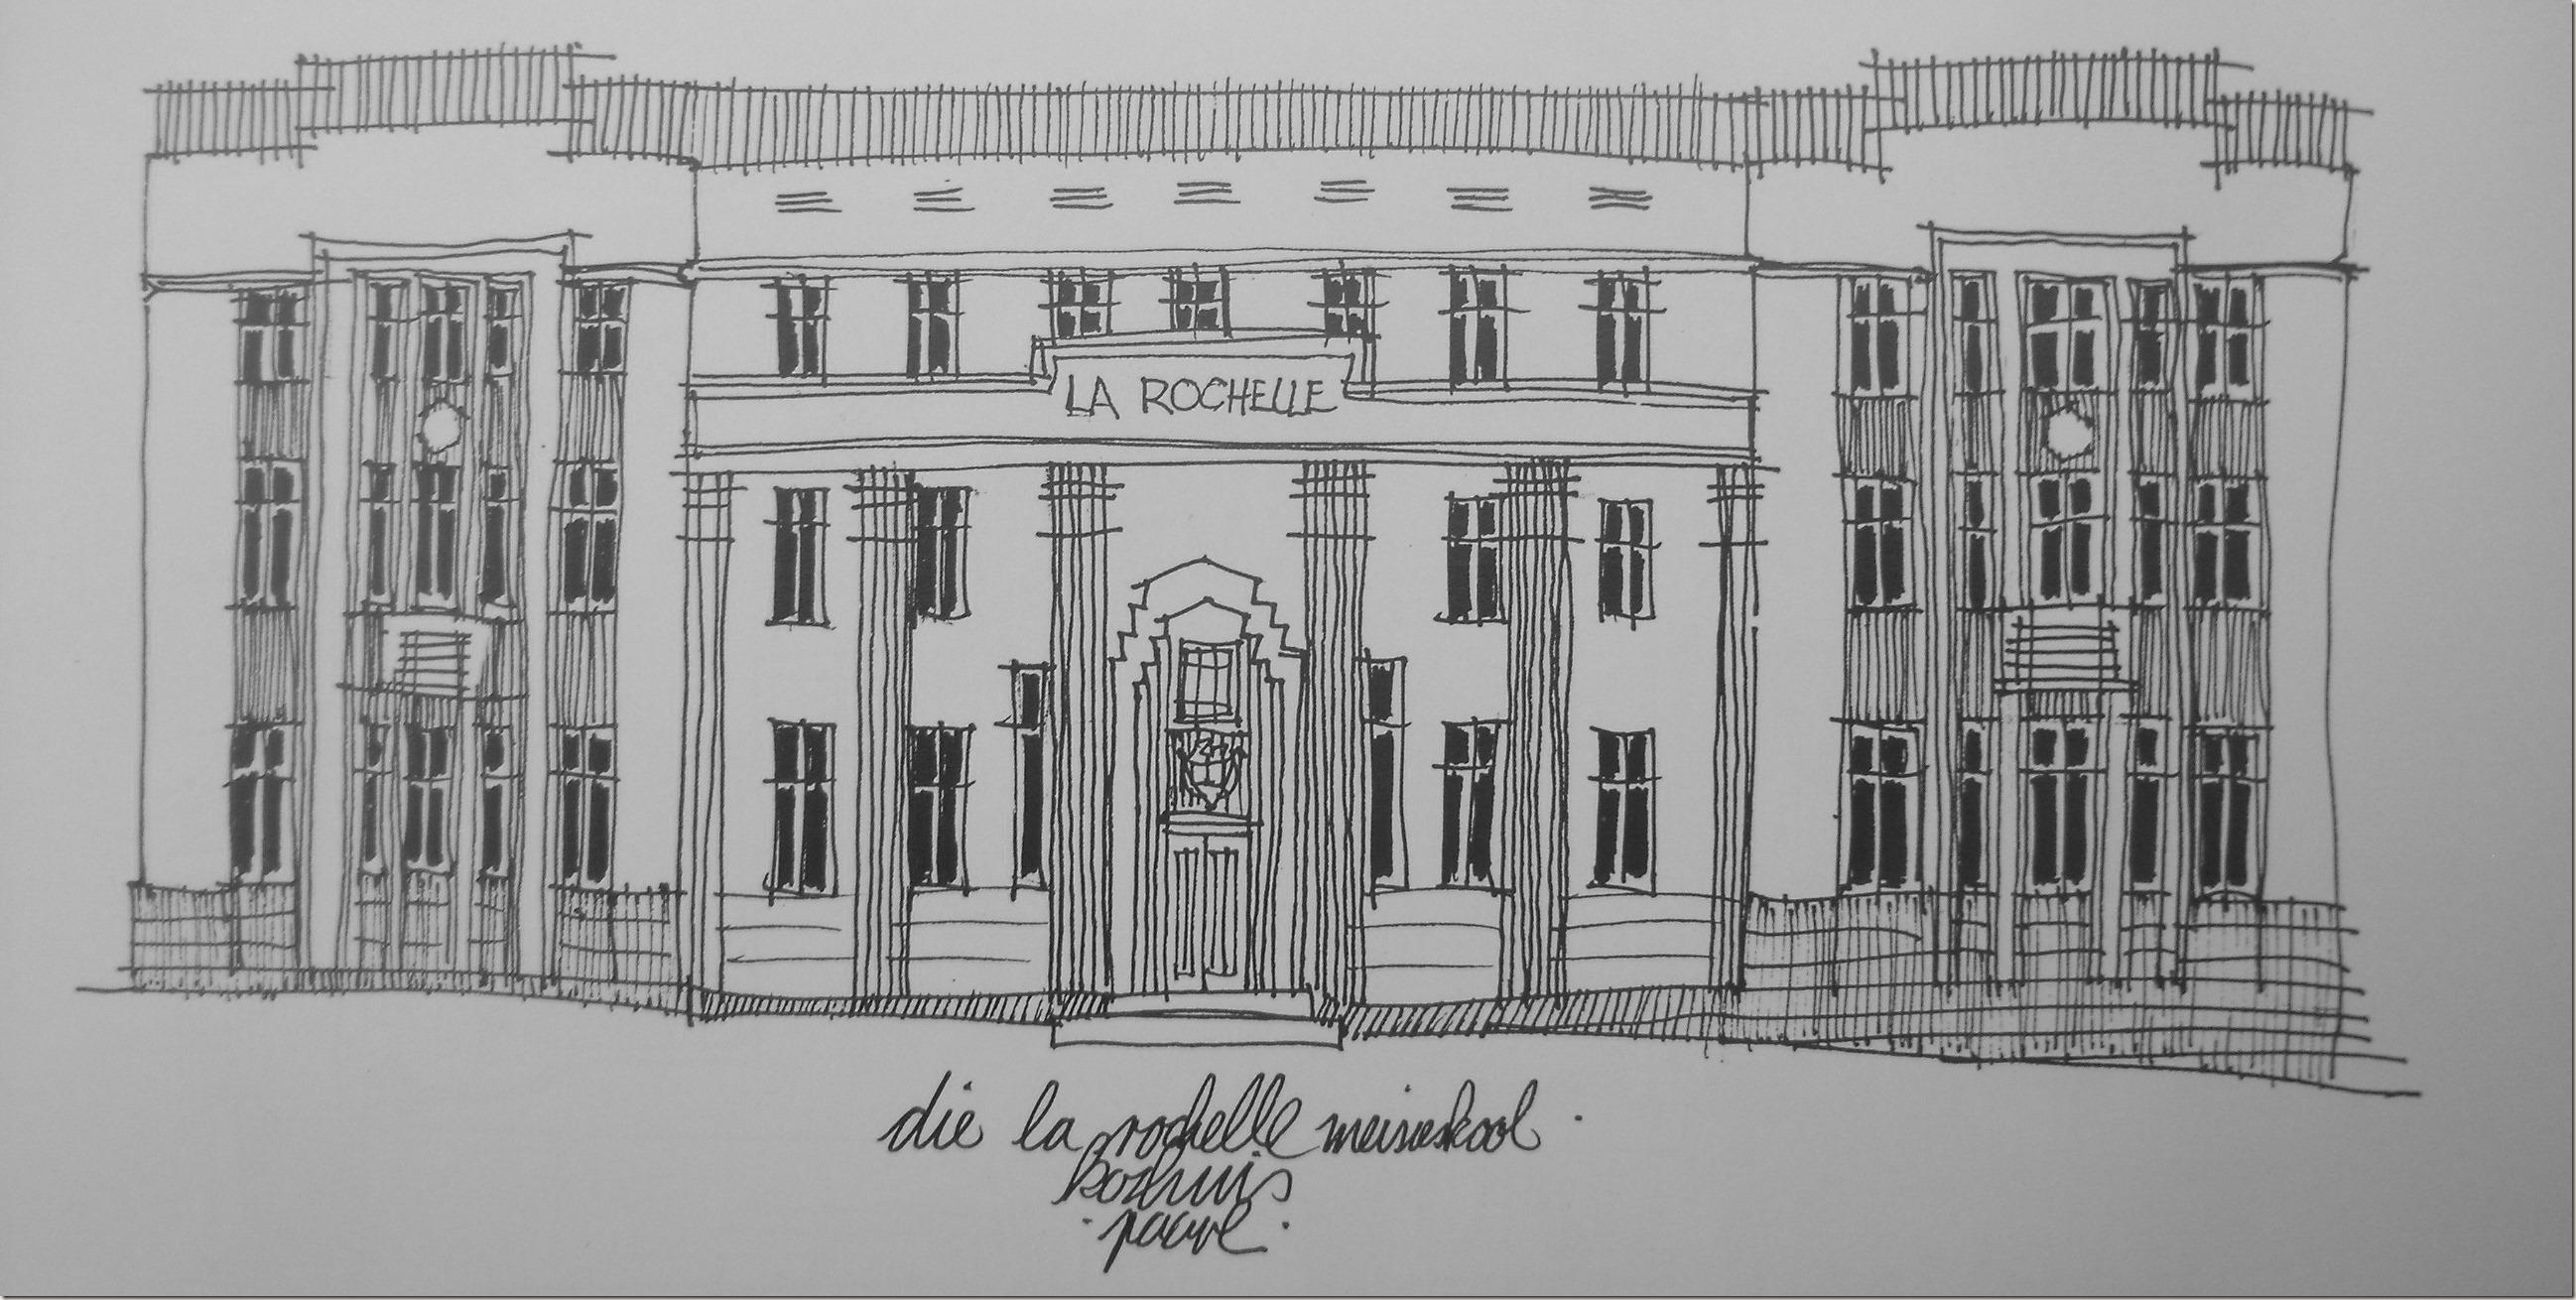 La Rochelle koshuis - Christof Albertyn